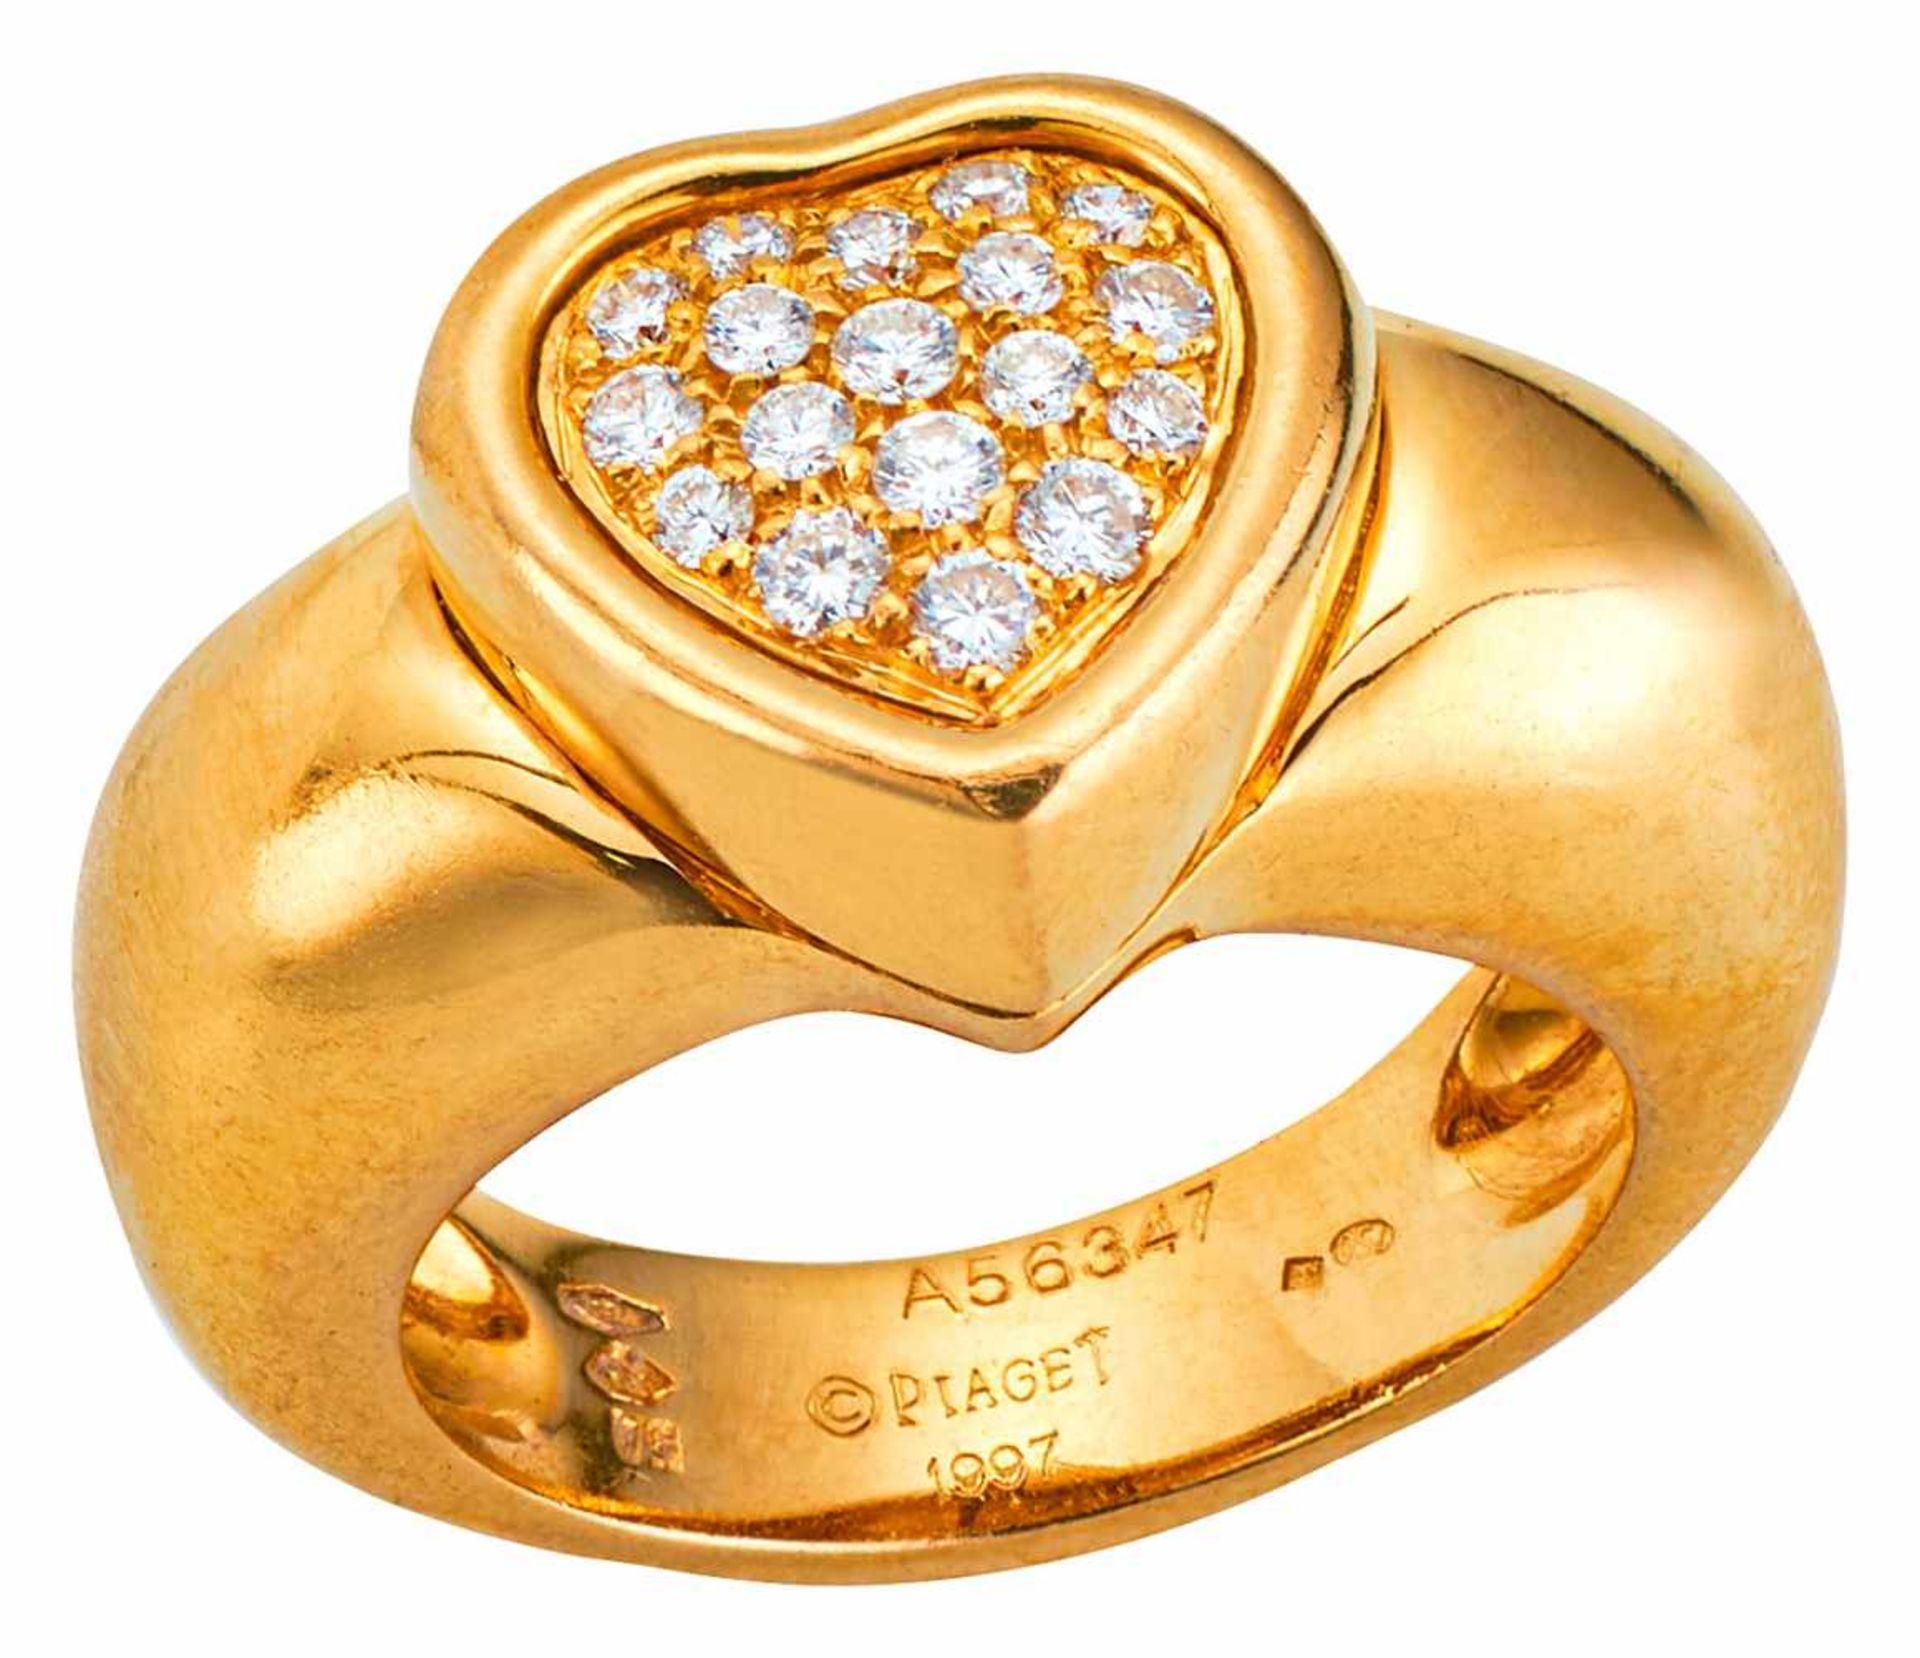 Piaget Herzring mit Diamantpavé